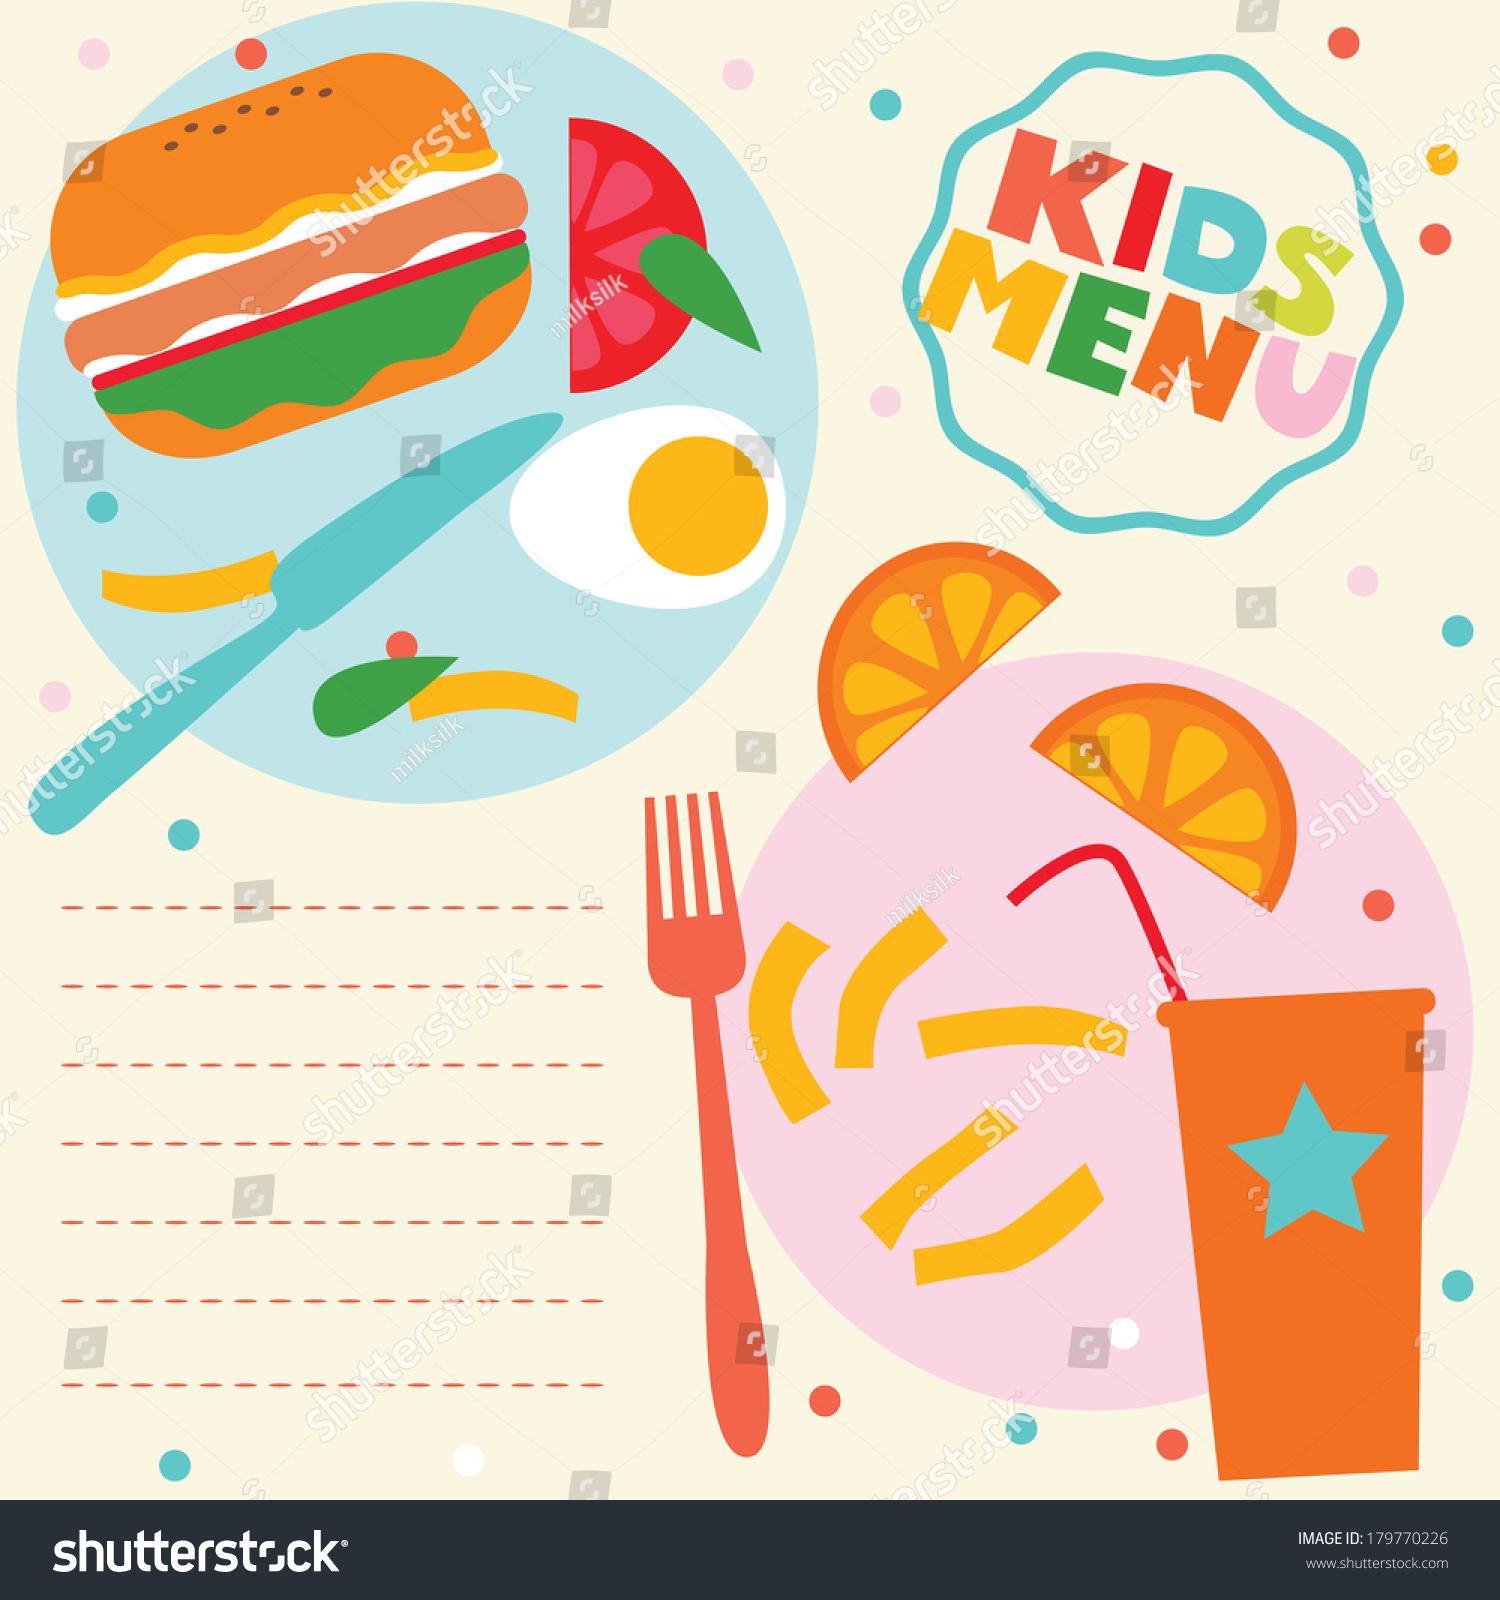 Kids menu template stock vector 179770226 shutterstock kids menu template pronofoot35fo Gallery